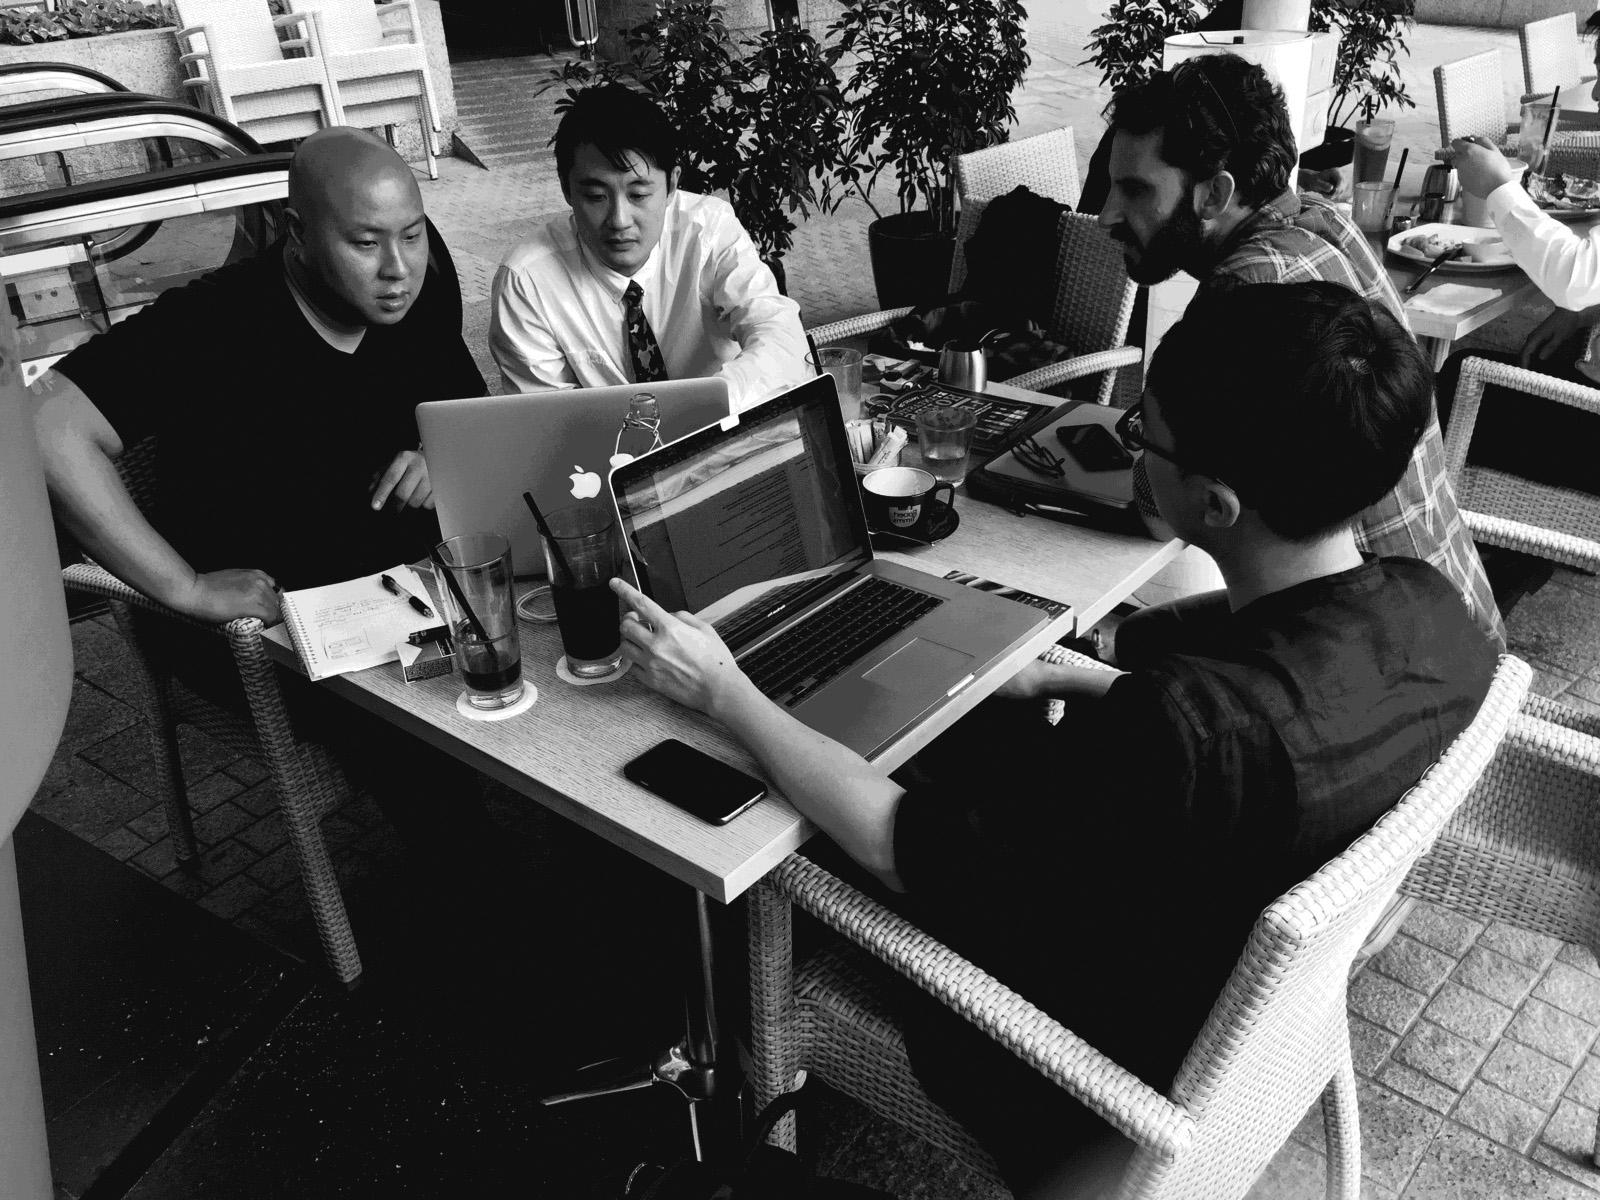 UX - User ResearchUX DesignUI DesignService DesignPrototypingIdeation